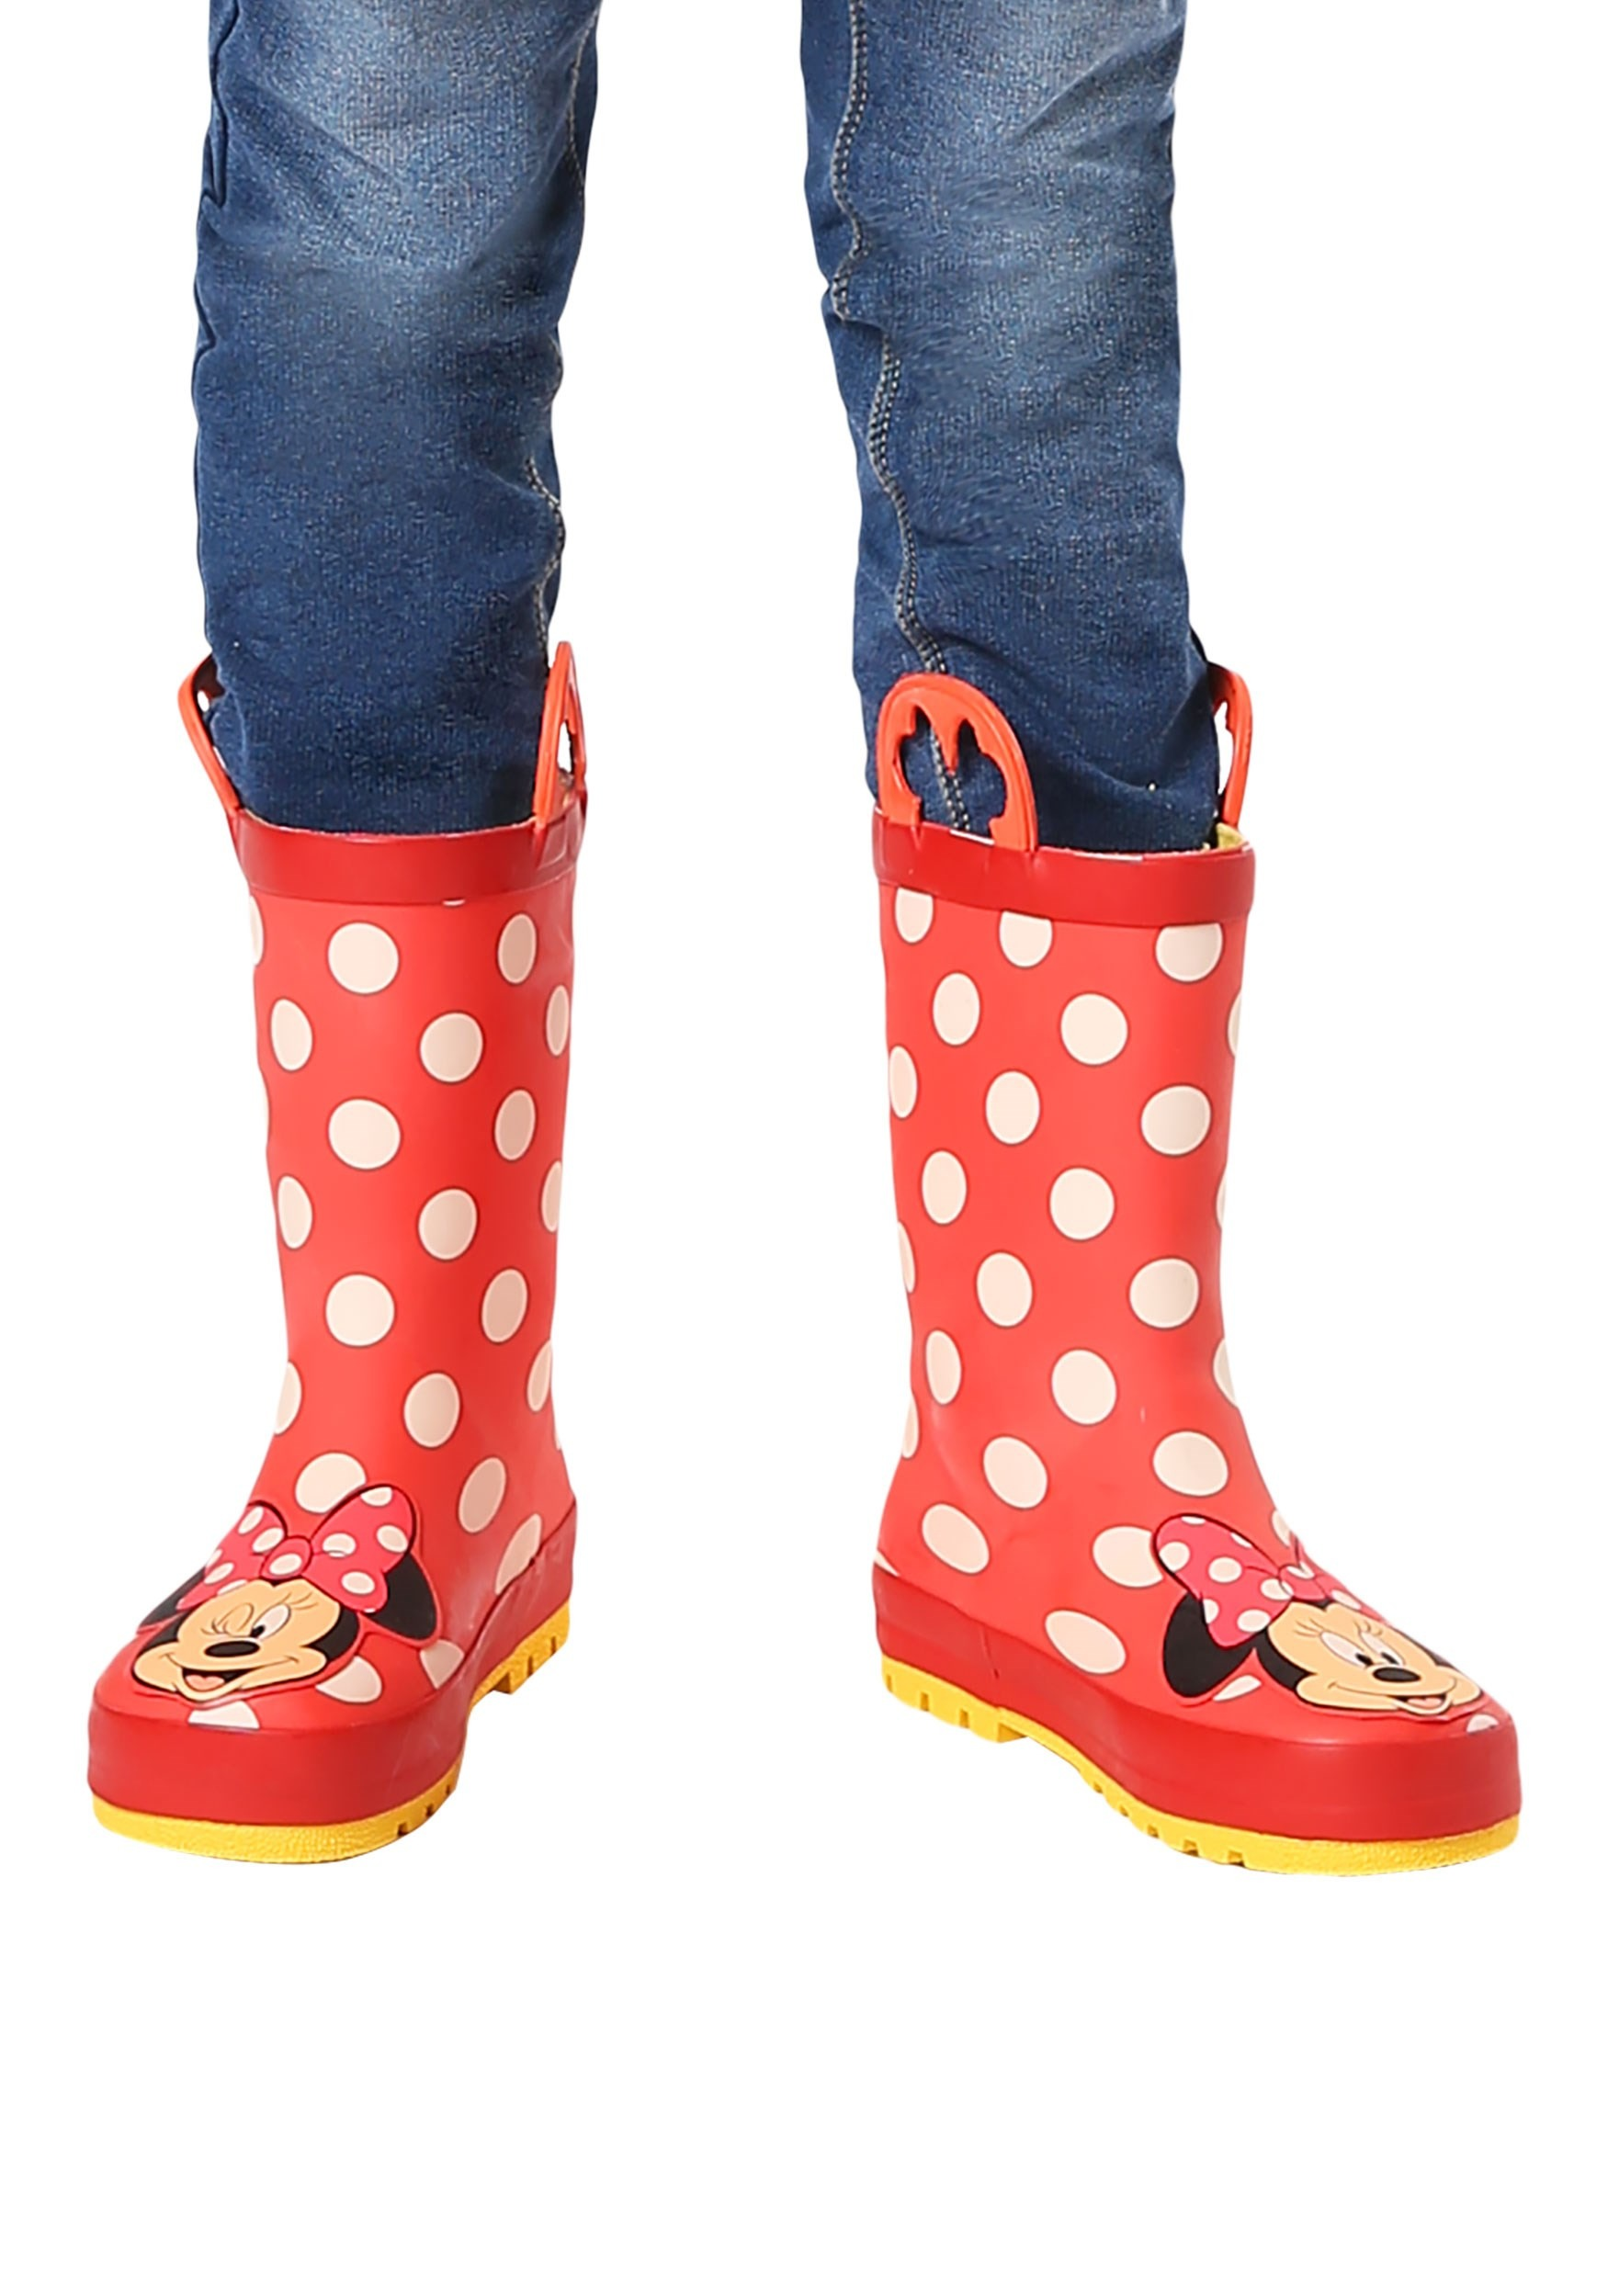 Disney Minnie Mouse Rain Boots